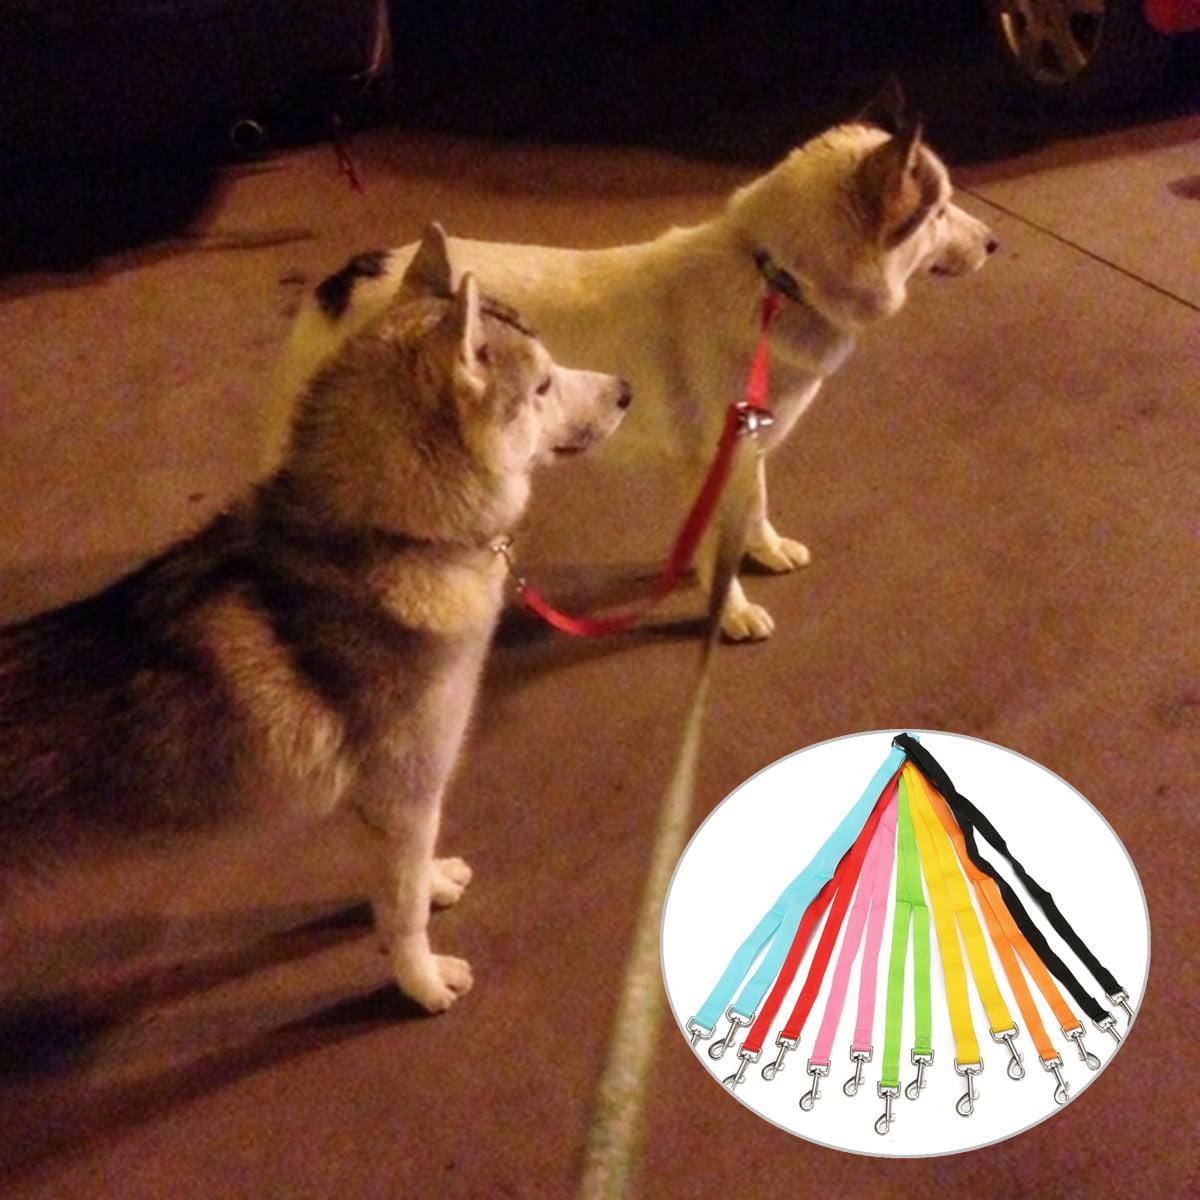 Double Dog Coupler Twin Lead - Safety Dog Leash Coupler Double Lead 2 Way No Tangle Dual Twin Walk Pet Duplex 50cm